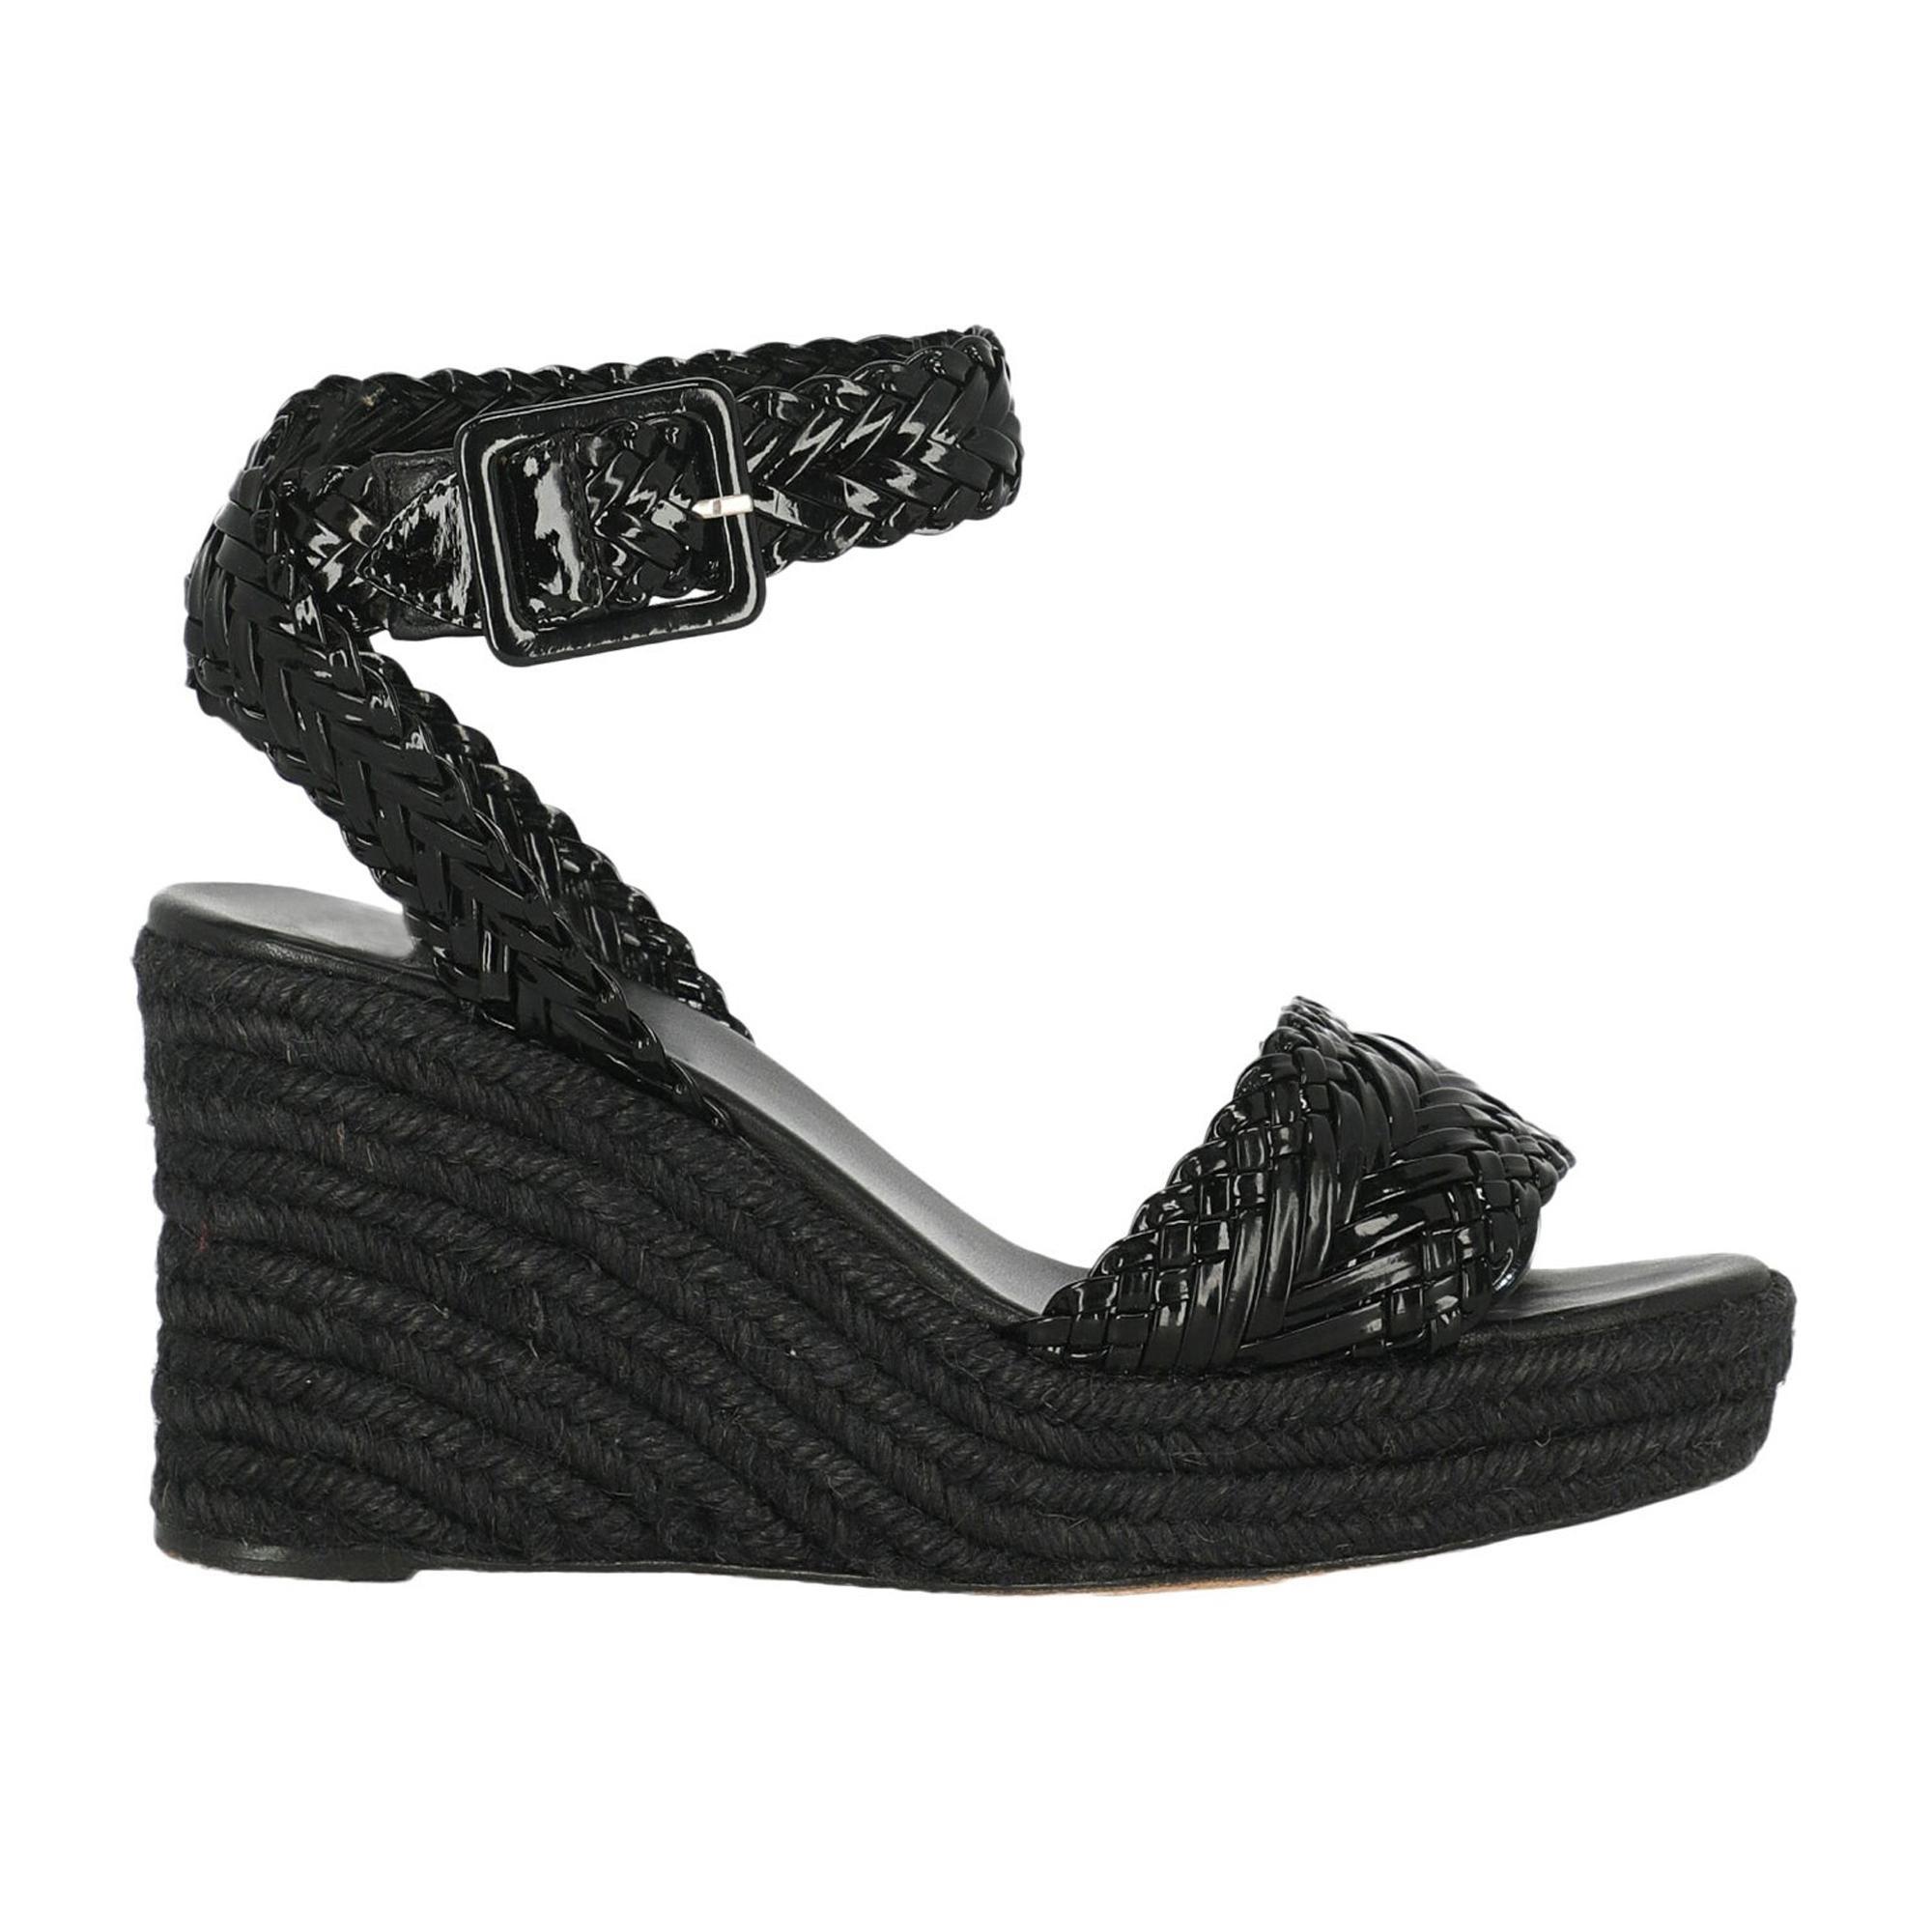 Hermès Woman Wedges Black Leather IT 38